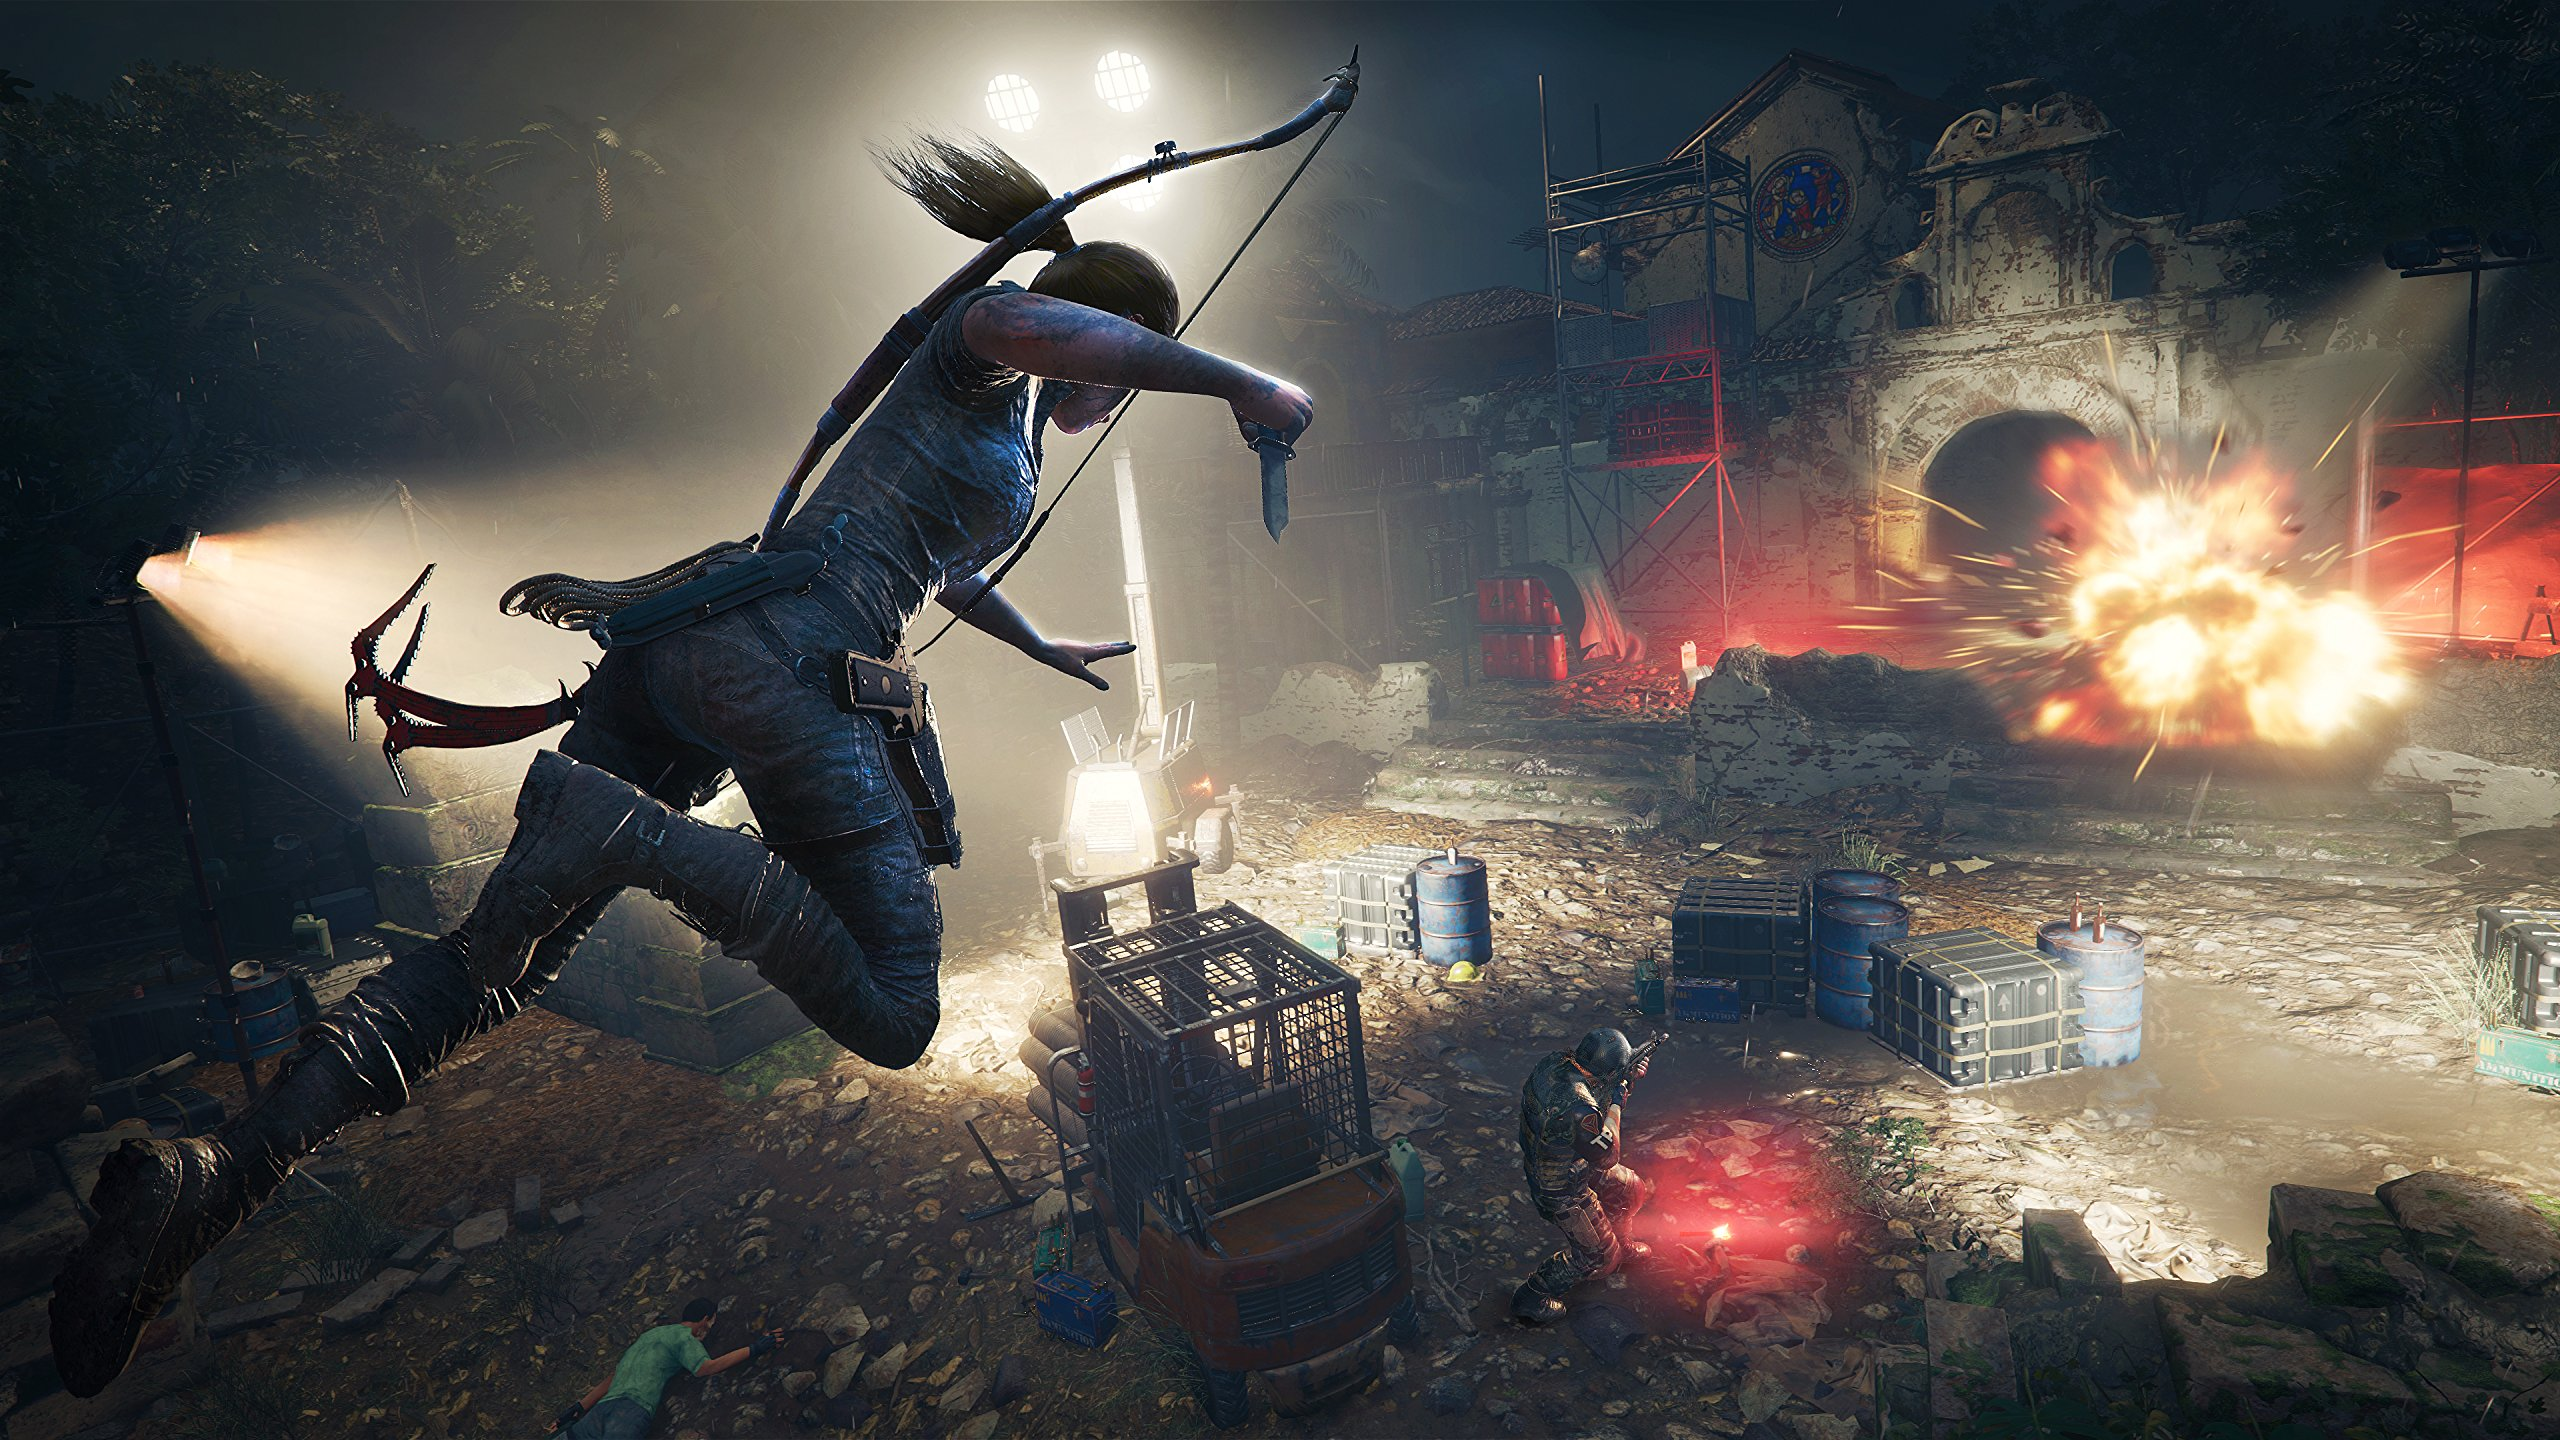 Shadow of the Tomb Raider promises Lara's most dangerous and terrifying adventure yet screenshot